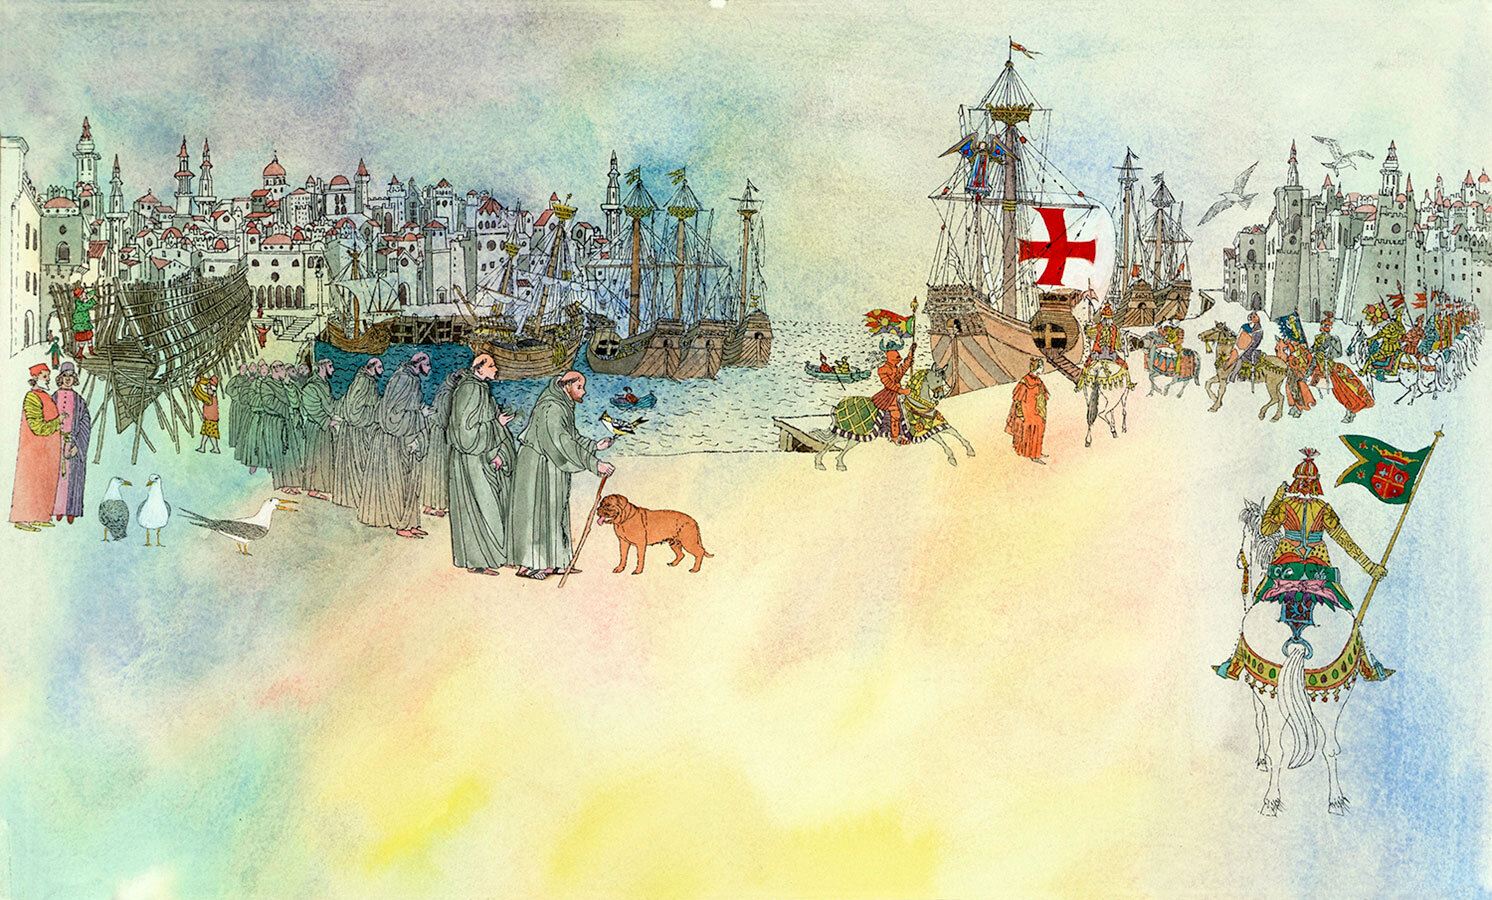 Francis-Crusades-original-illustration-from-Saint-Francis-by-Brian-Wildsmith.jpg